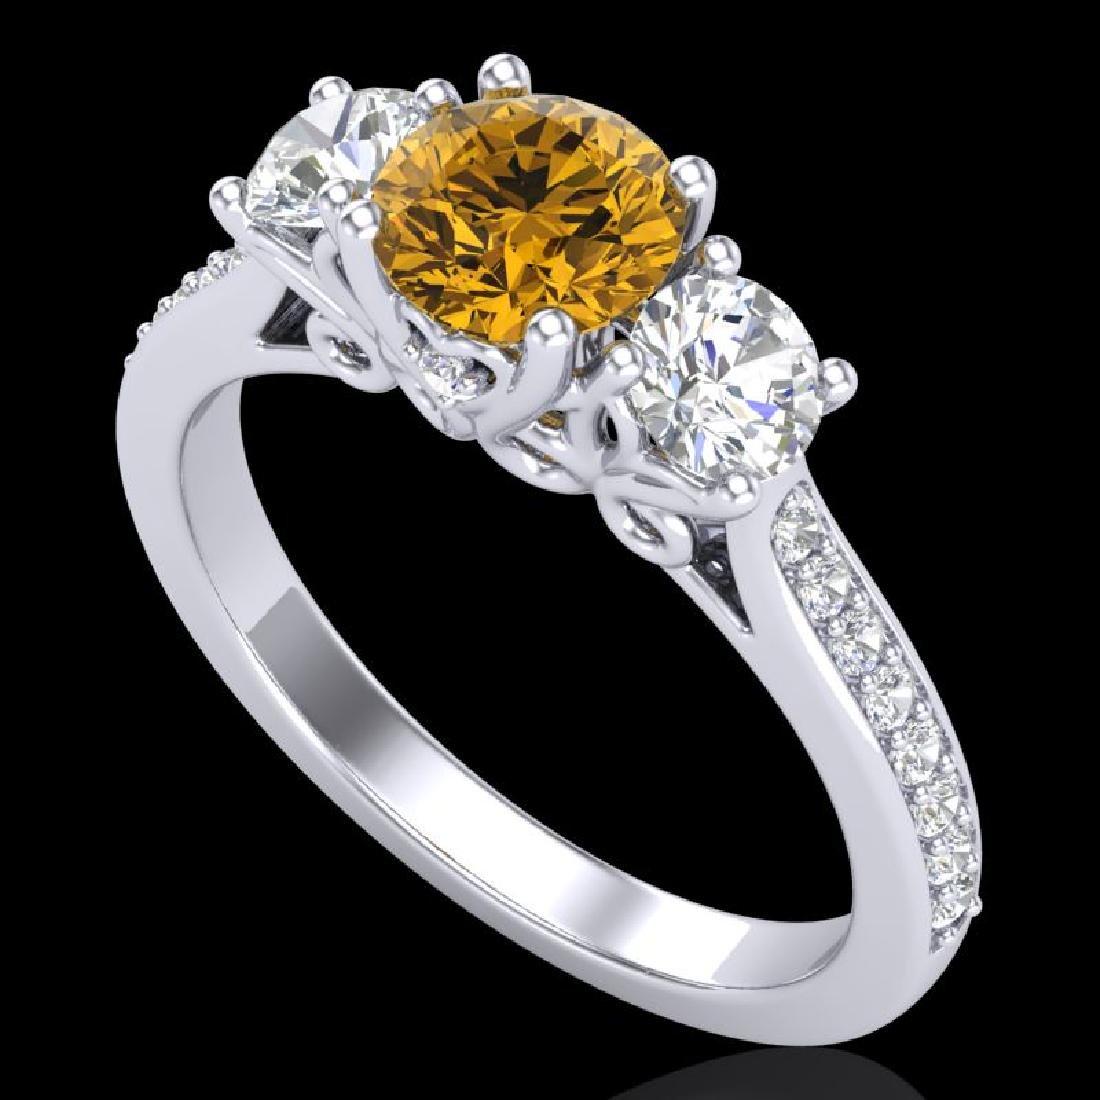 1.67 CTW Intense Fancy Yellow Diamond Art Deco 3 Stone